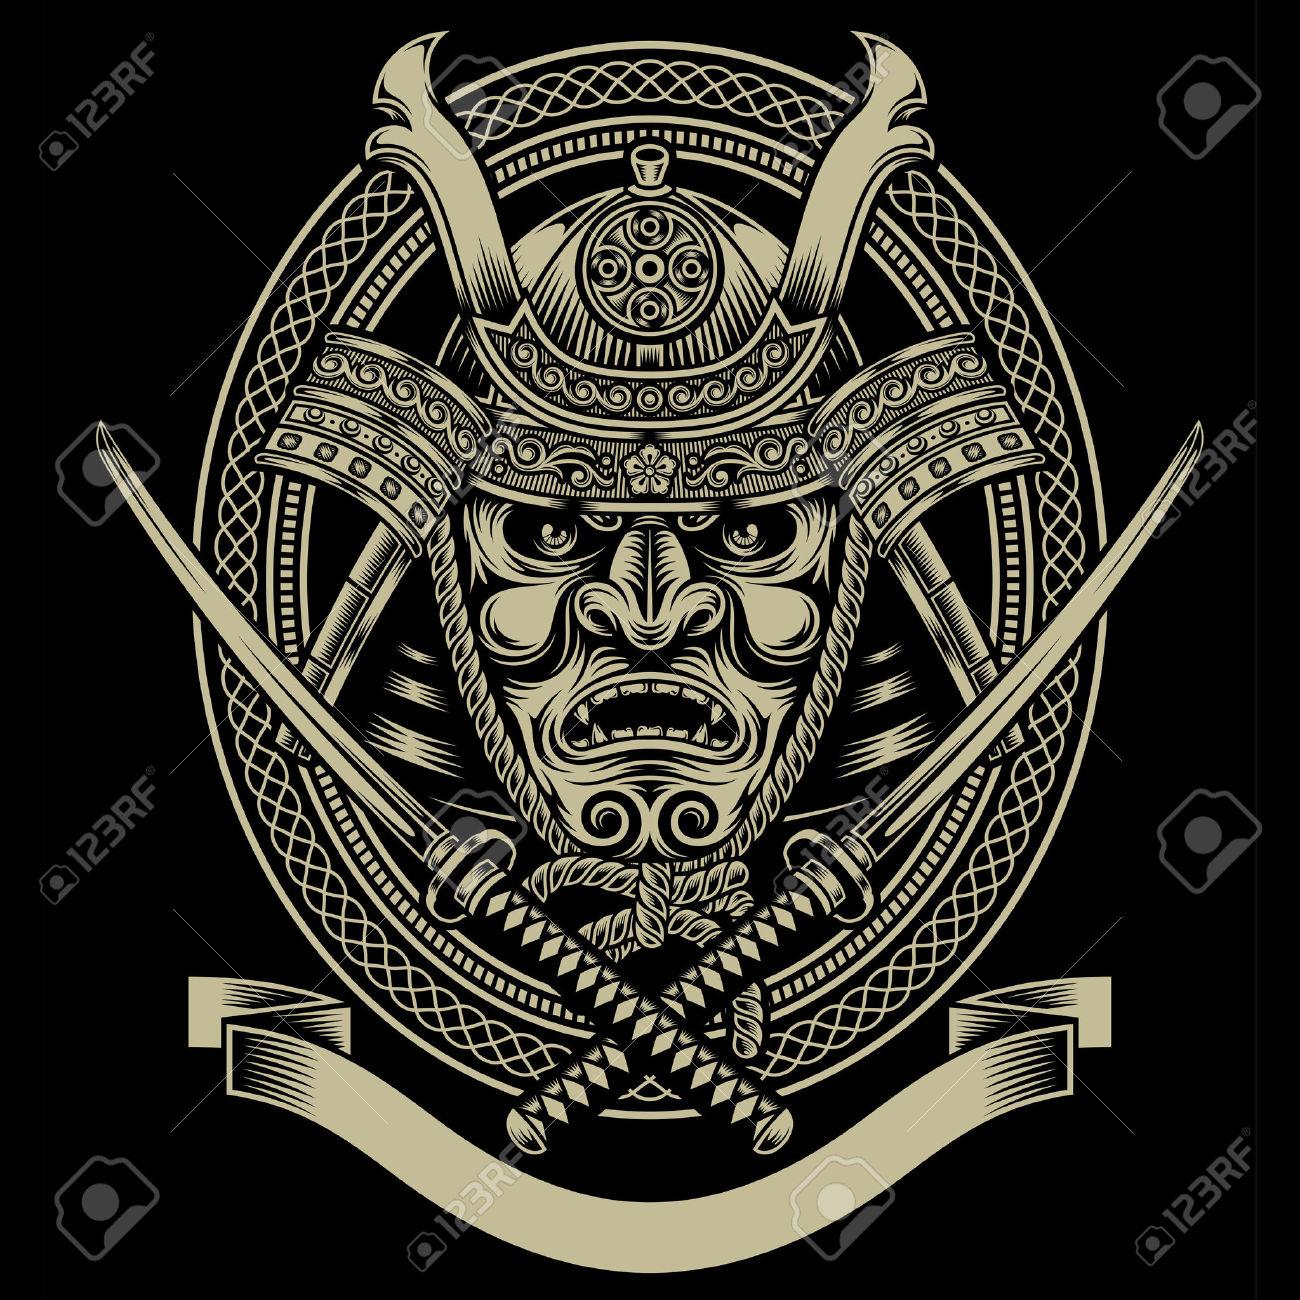 1300x1300 Escudo Samurai Tatoos Samurai, Masking And Google